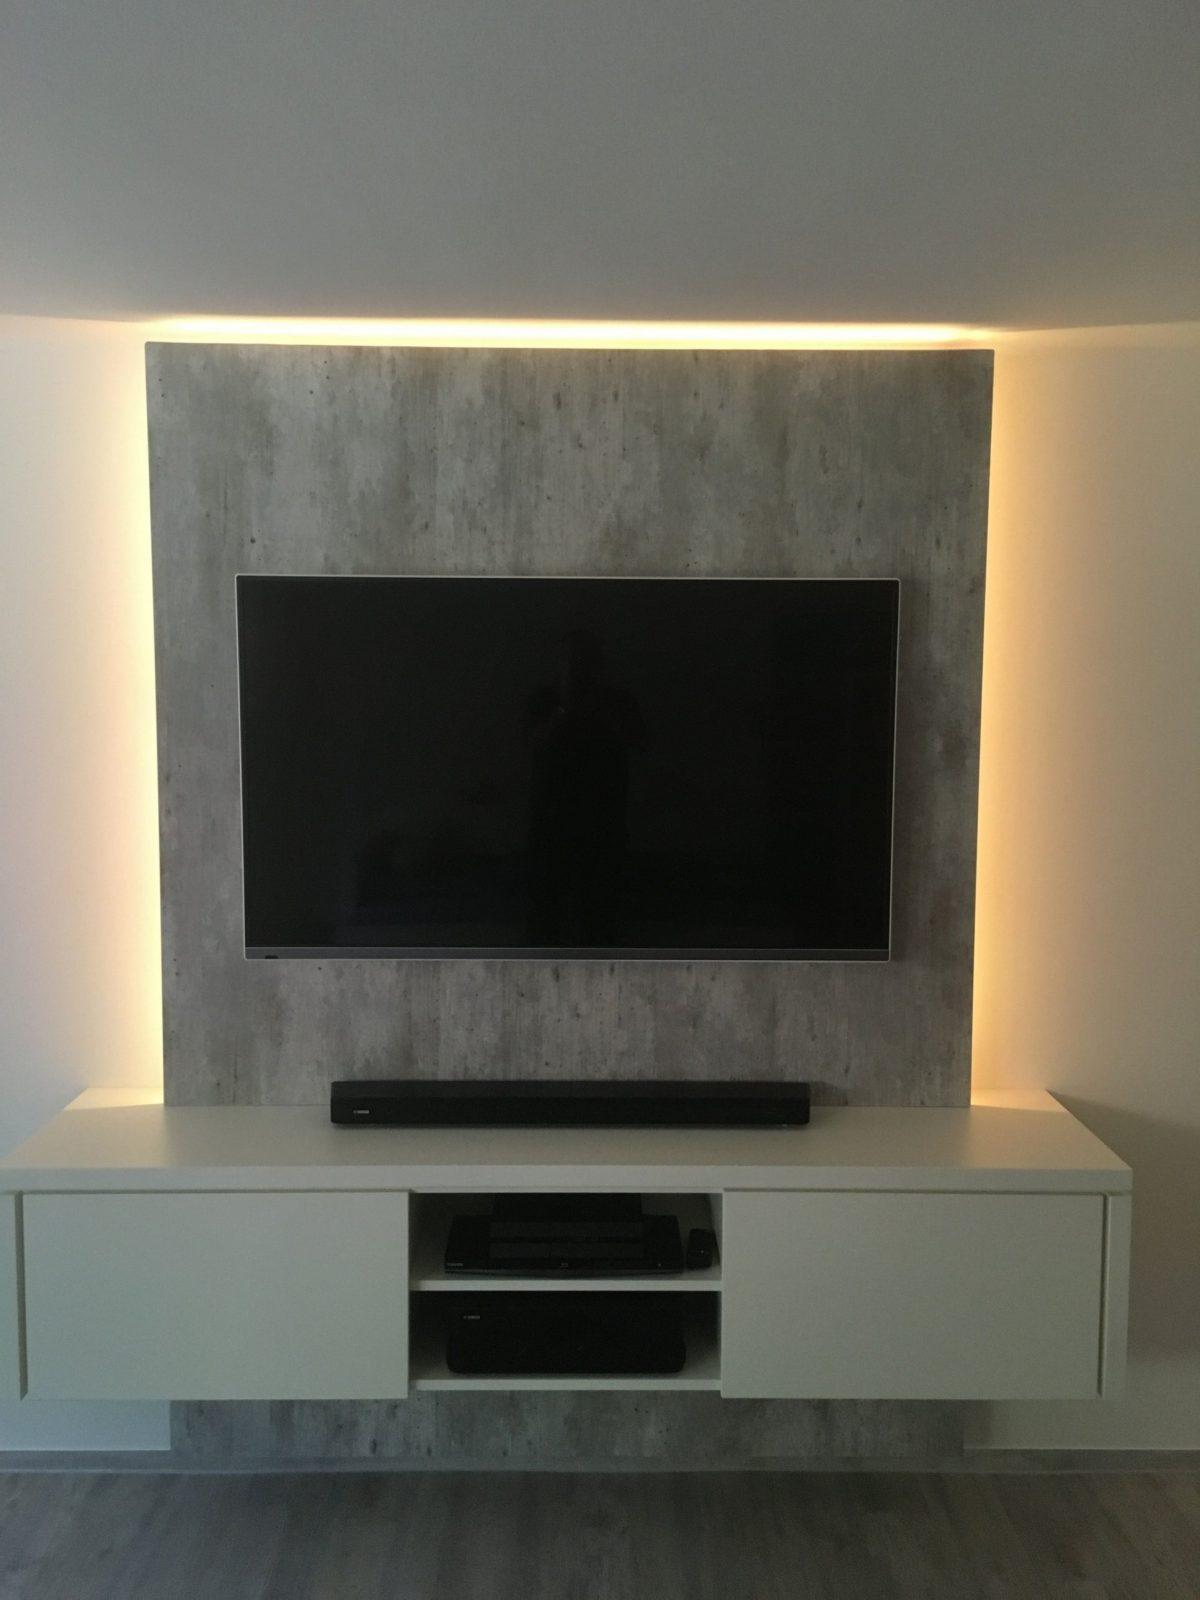 35 Moderne Tv Kabel Verstecken Wand  Ahhadesigns von Tv An Wand Kabel Verstecken Photo